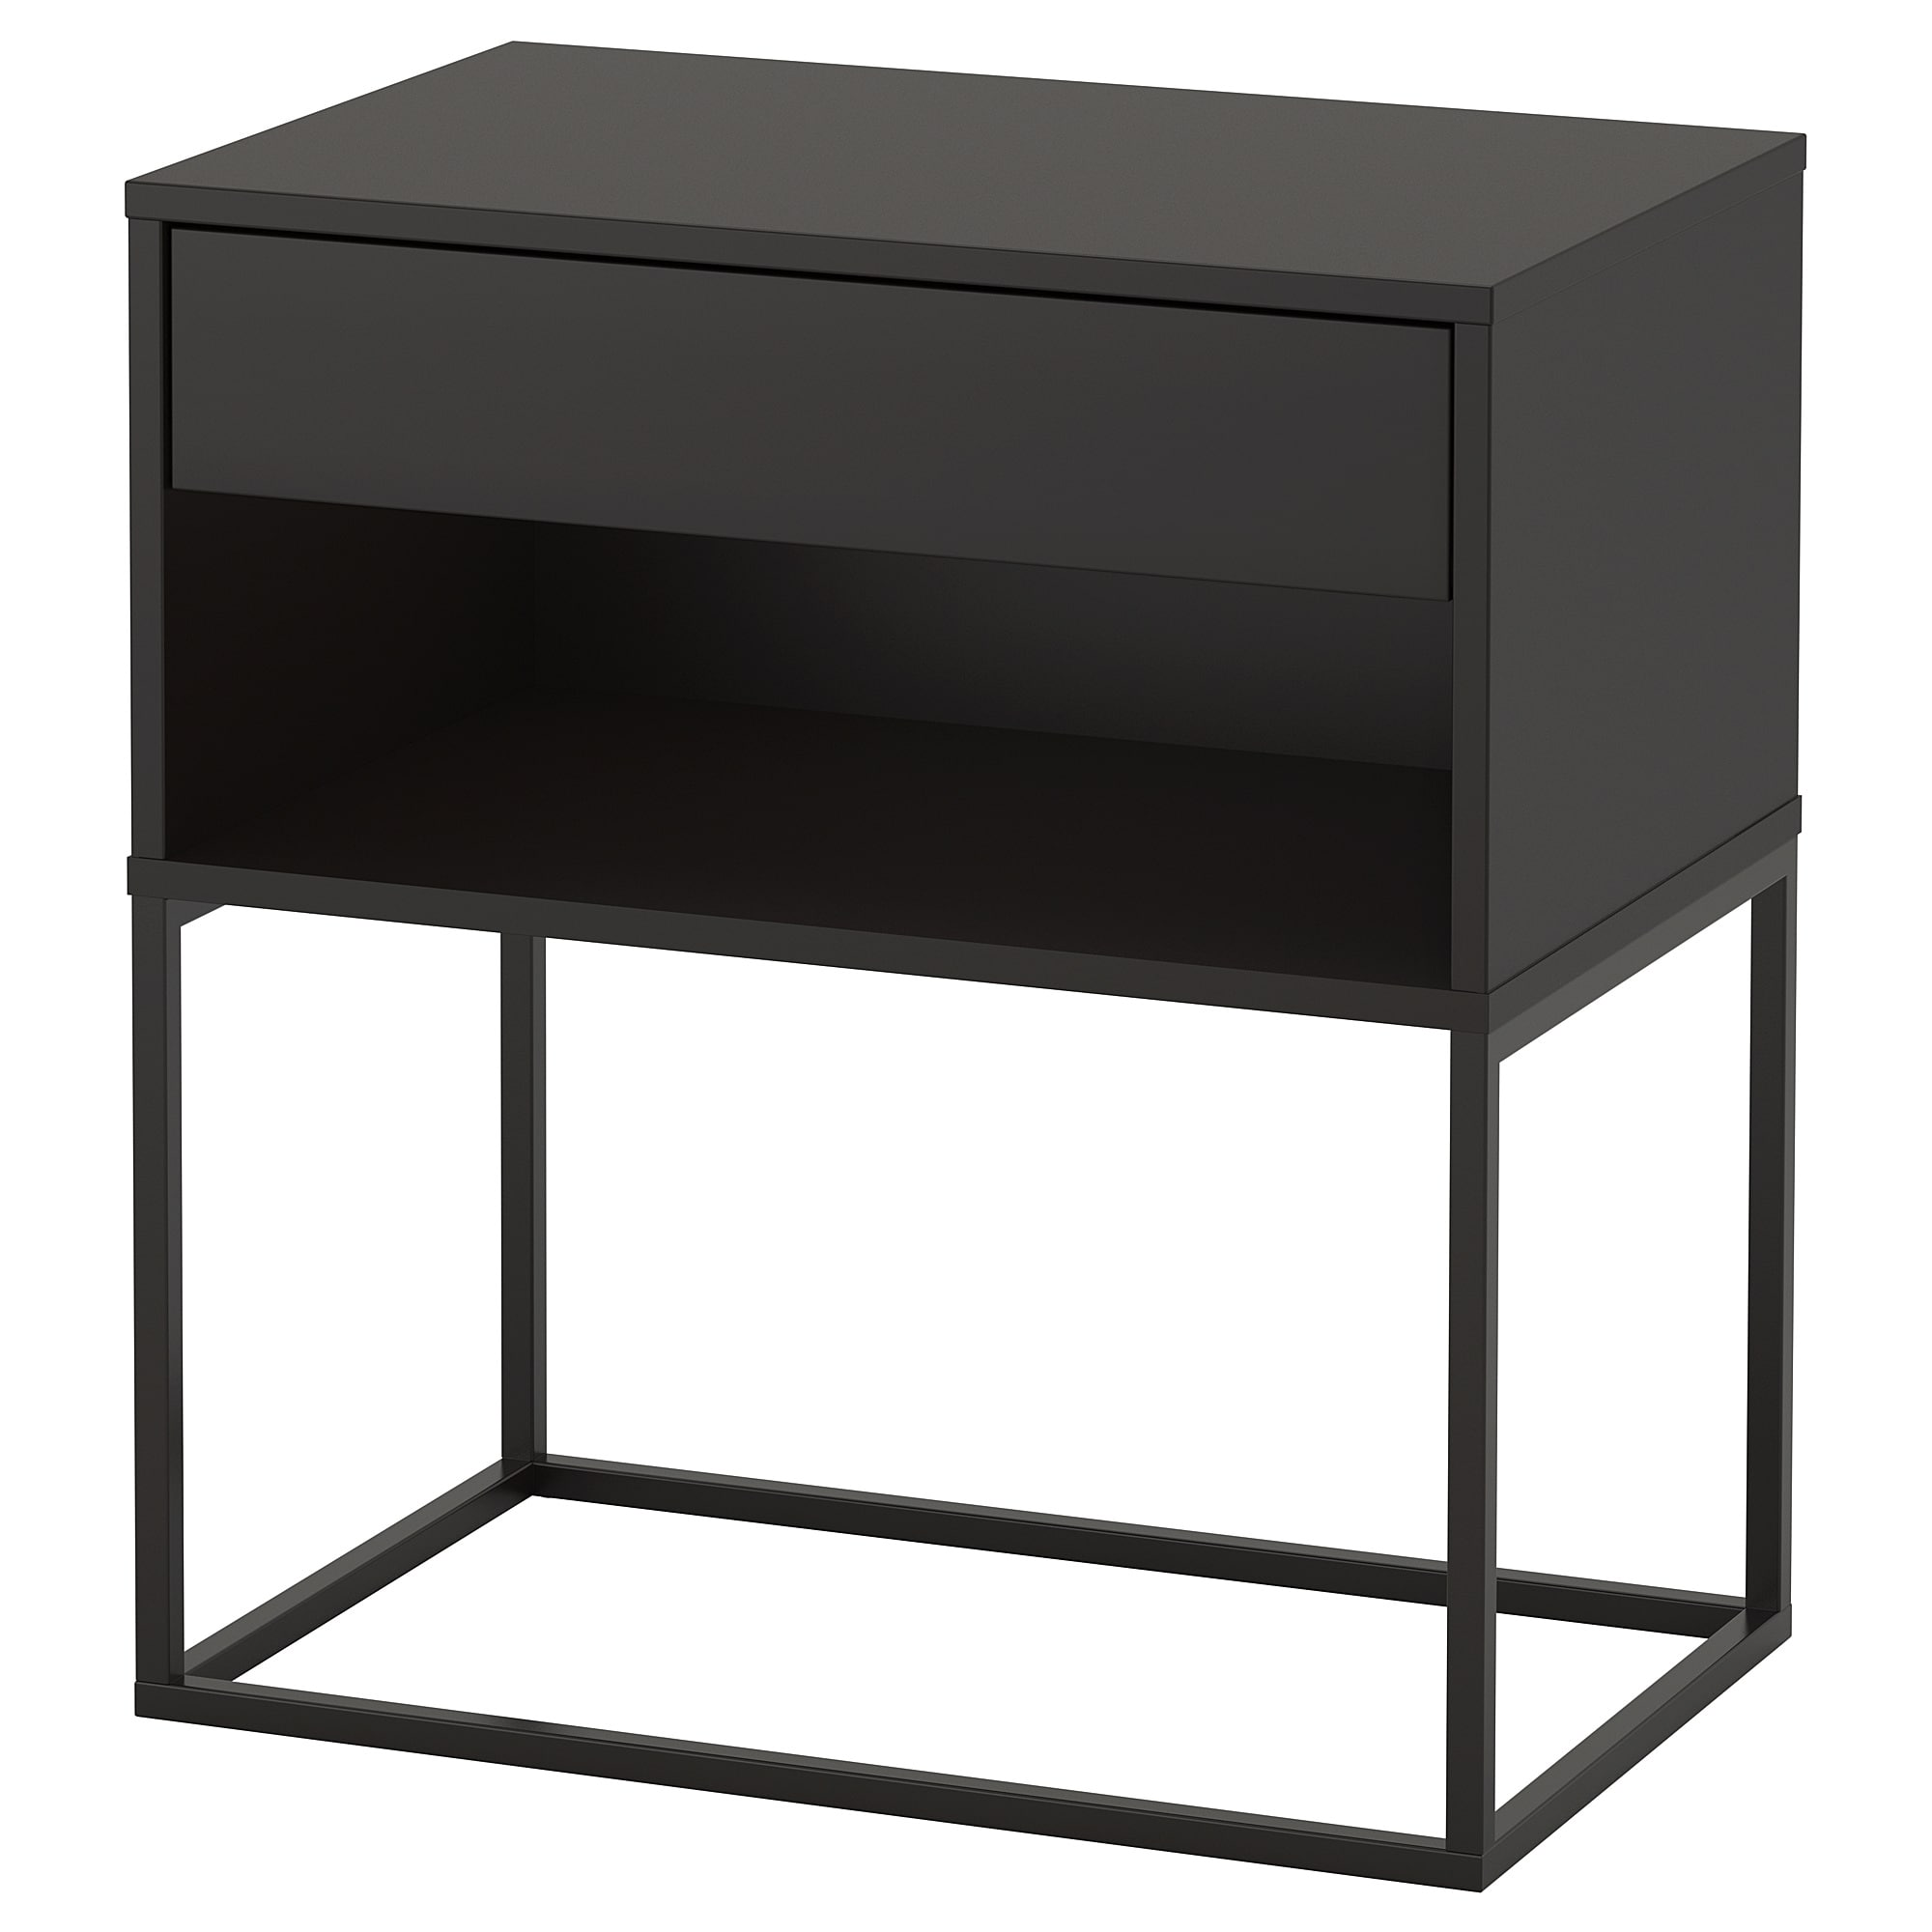 VIKHAMMER Bedside table, white, 6x6 cm - IKEA  Black bedside